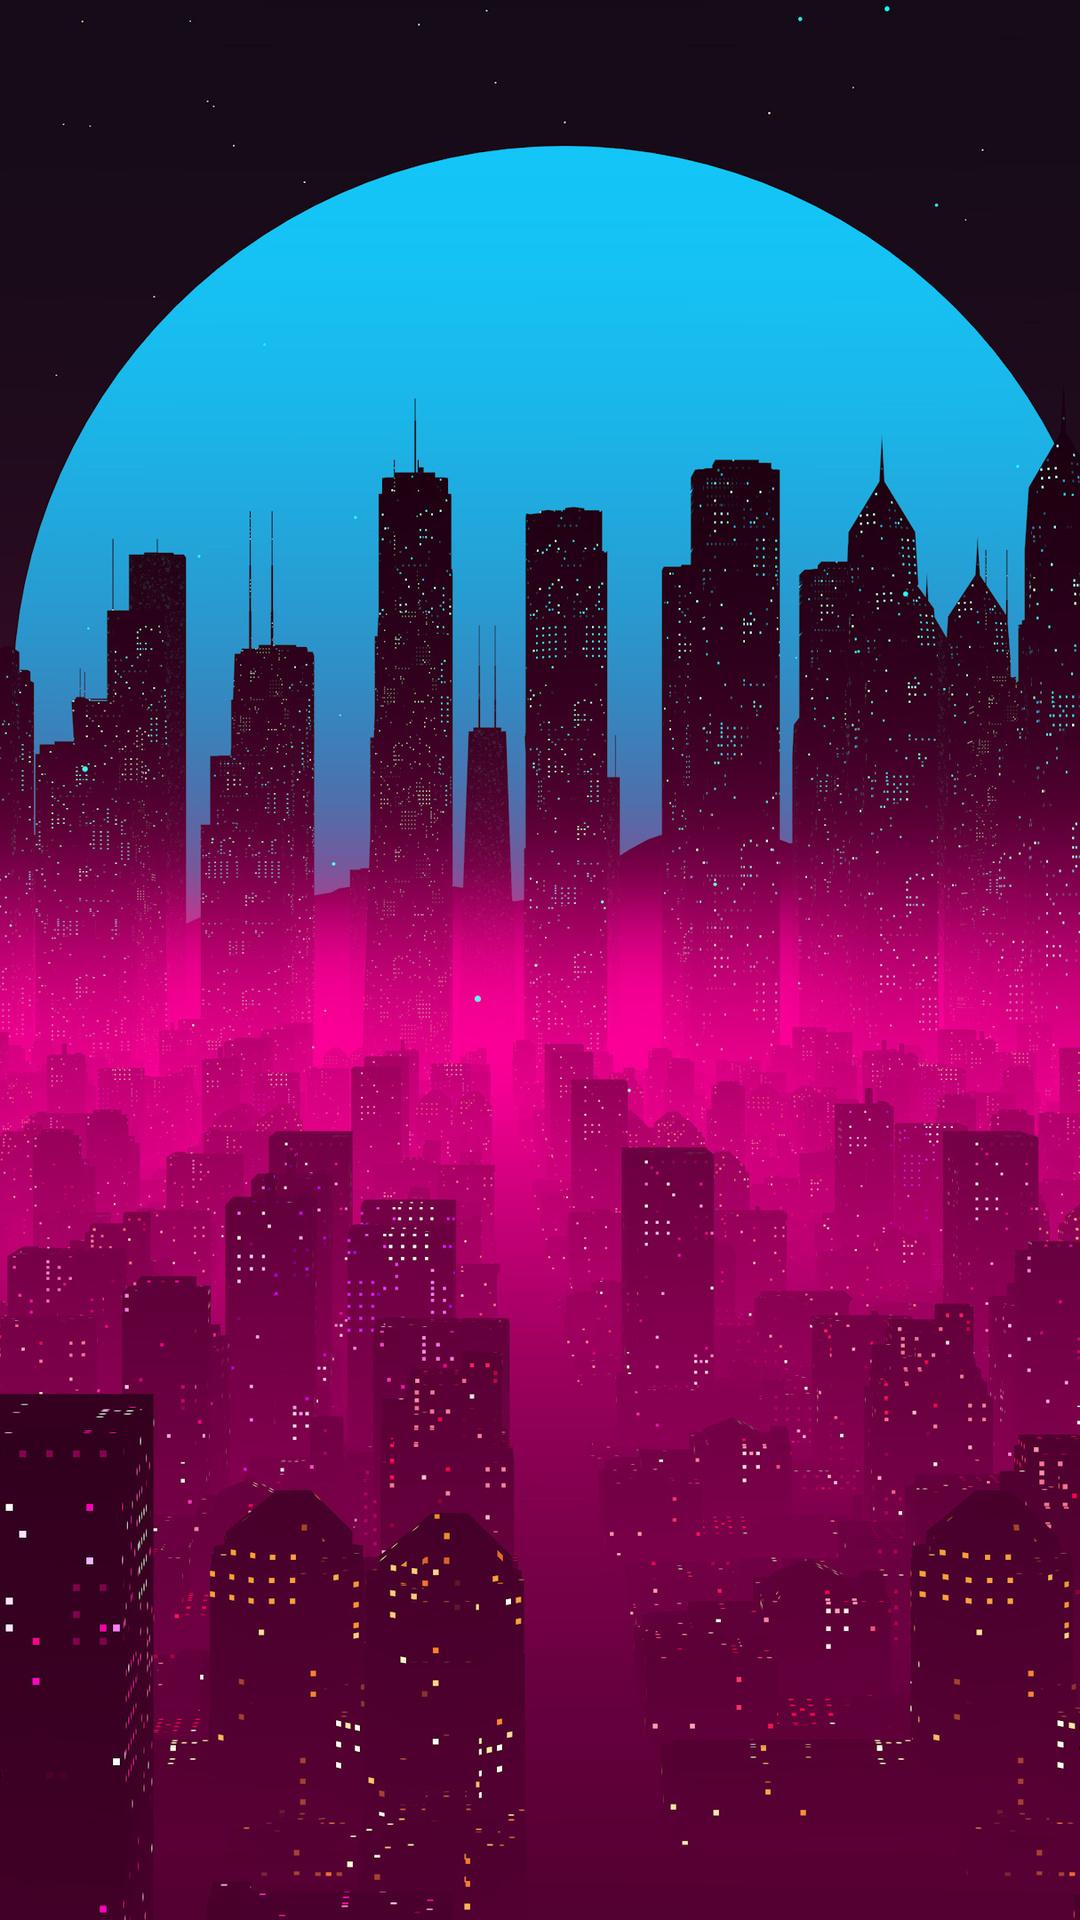 vapor-synthwave-retro-city-4k-xu.jpg